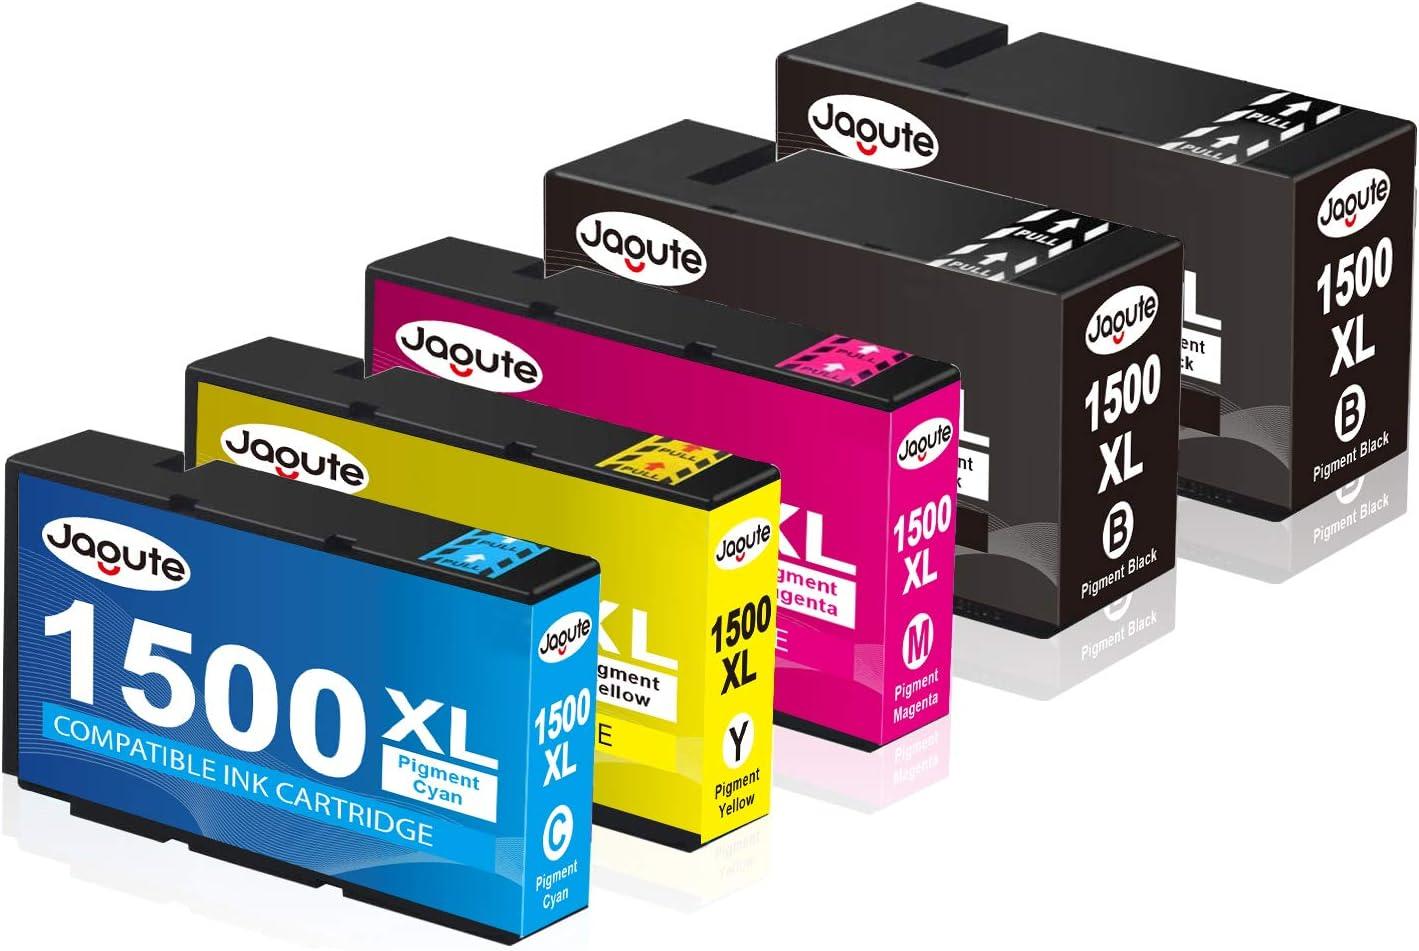 Jagute Ersatz Für Canon Pgi 1500xl Pgi 1500 Druckerpatronen Für Canon Maxify Mb2000 Mb2050 Mb2150 Mb2155 Mb2300 Mb2350 Mb2750 Mb2755 5er Pack 2 Schwarz 1 Blau 1 Rot 1 Gelb Bürobedarf Schreibwaren